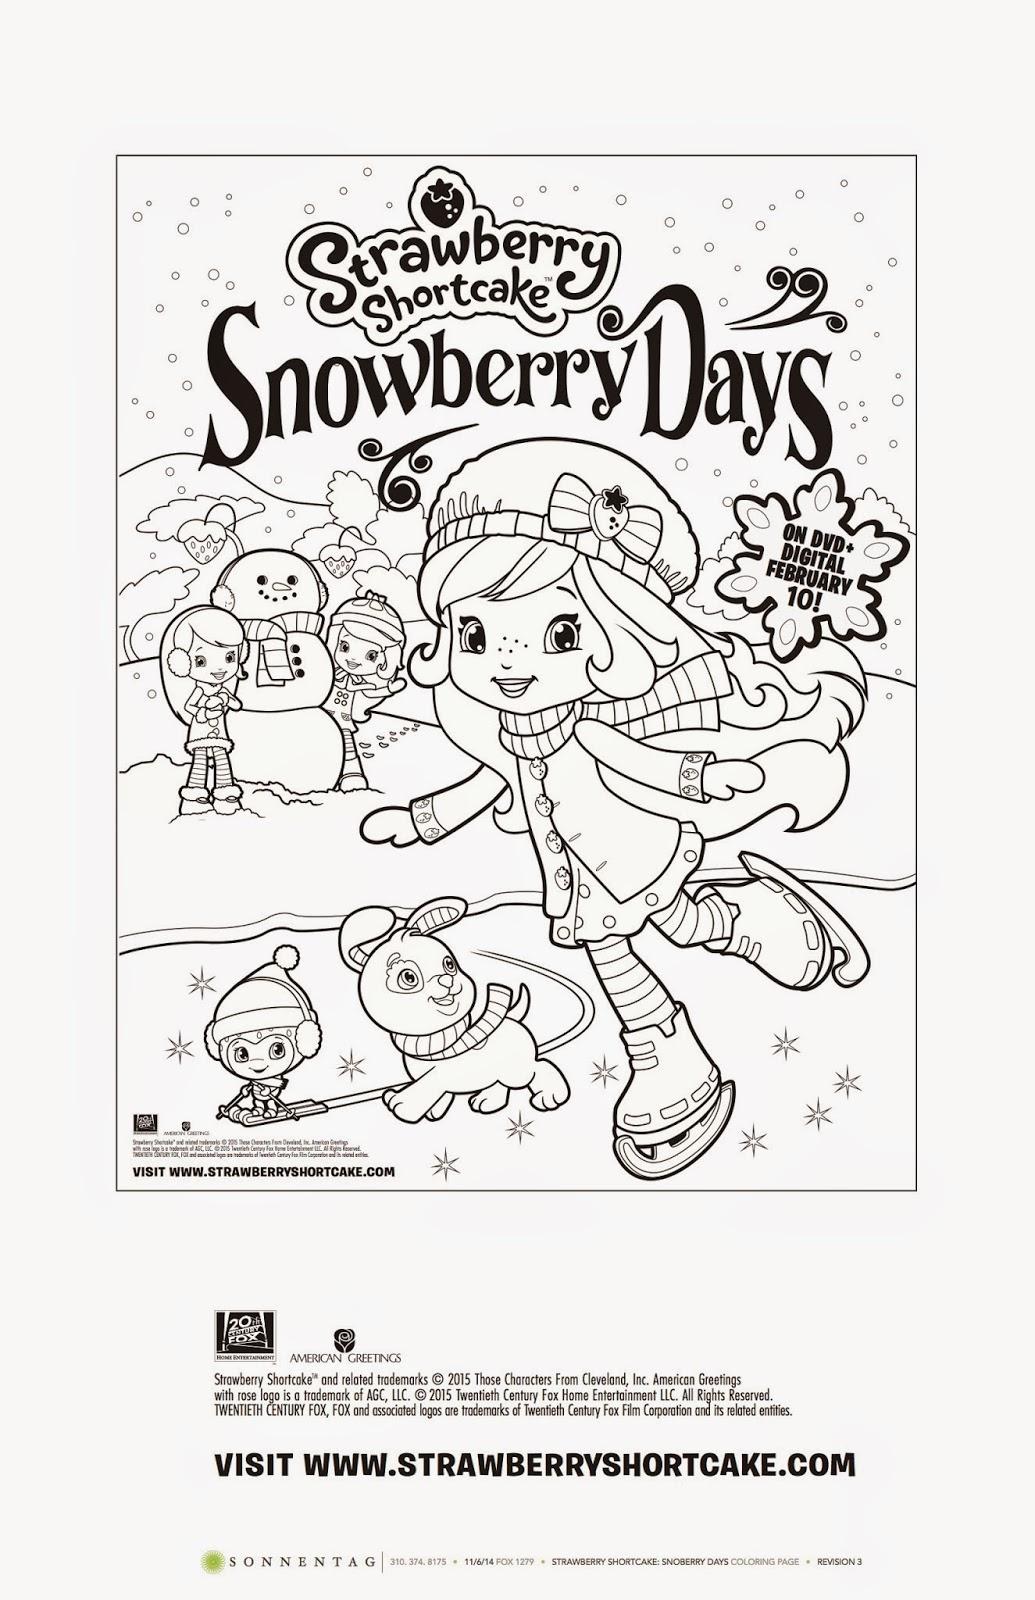 Heck Of A Bunch Strawberry Shortcake Snowberry Days